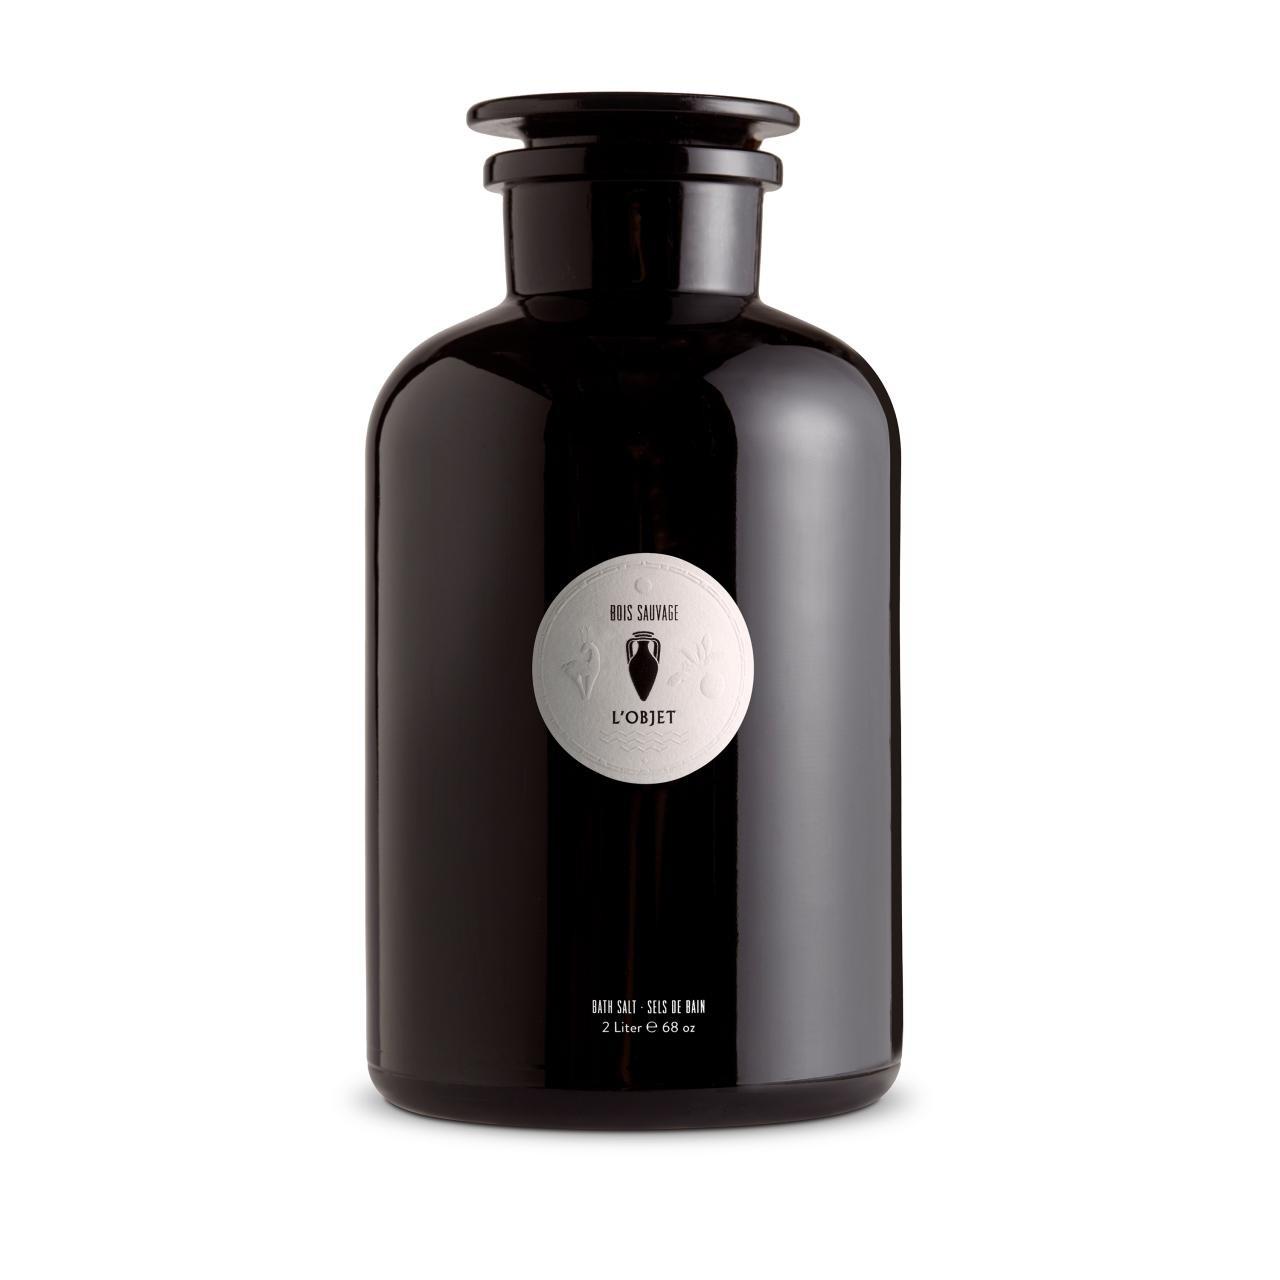 L'Objet I Bois Sauvage Bath Salt - Large